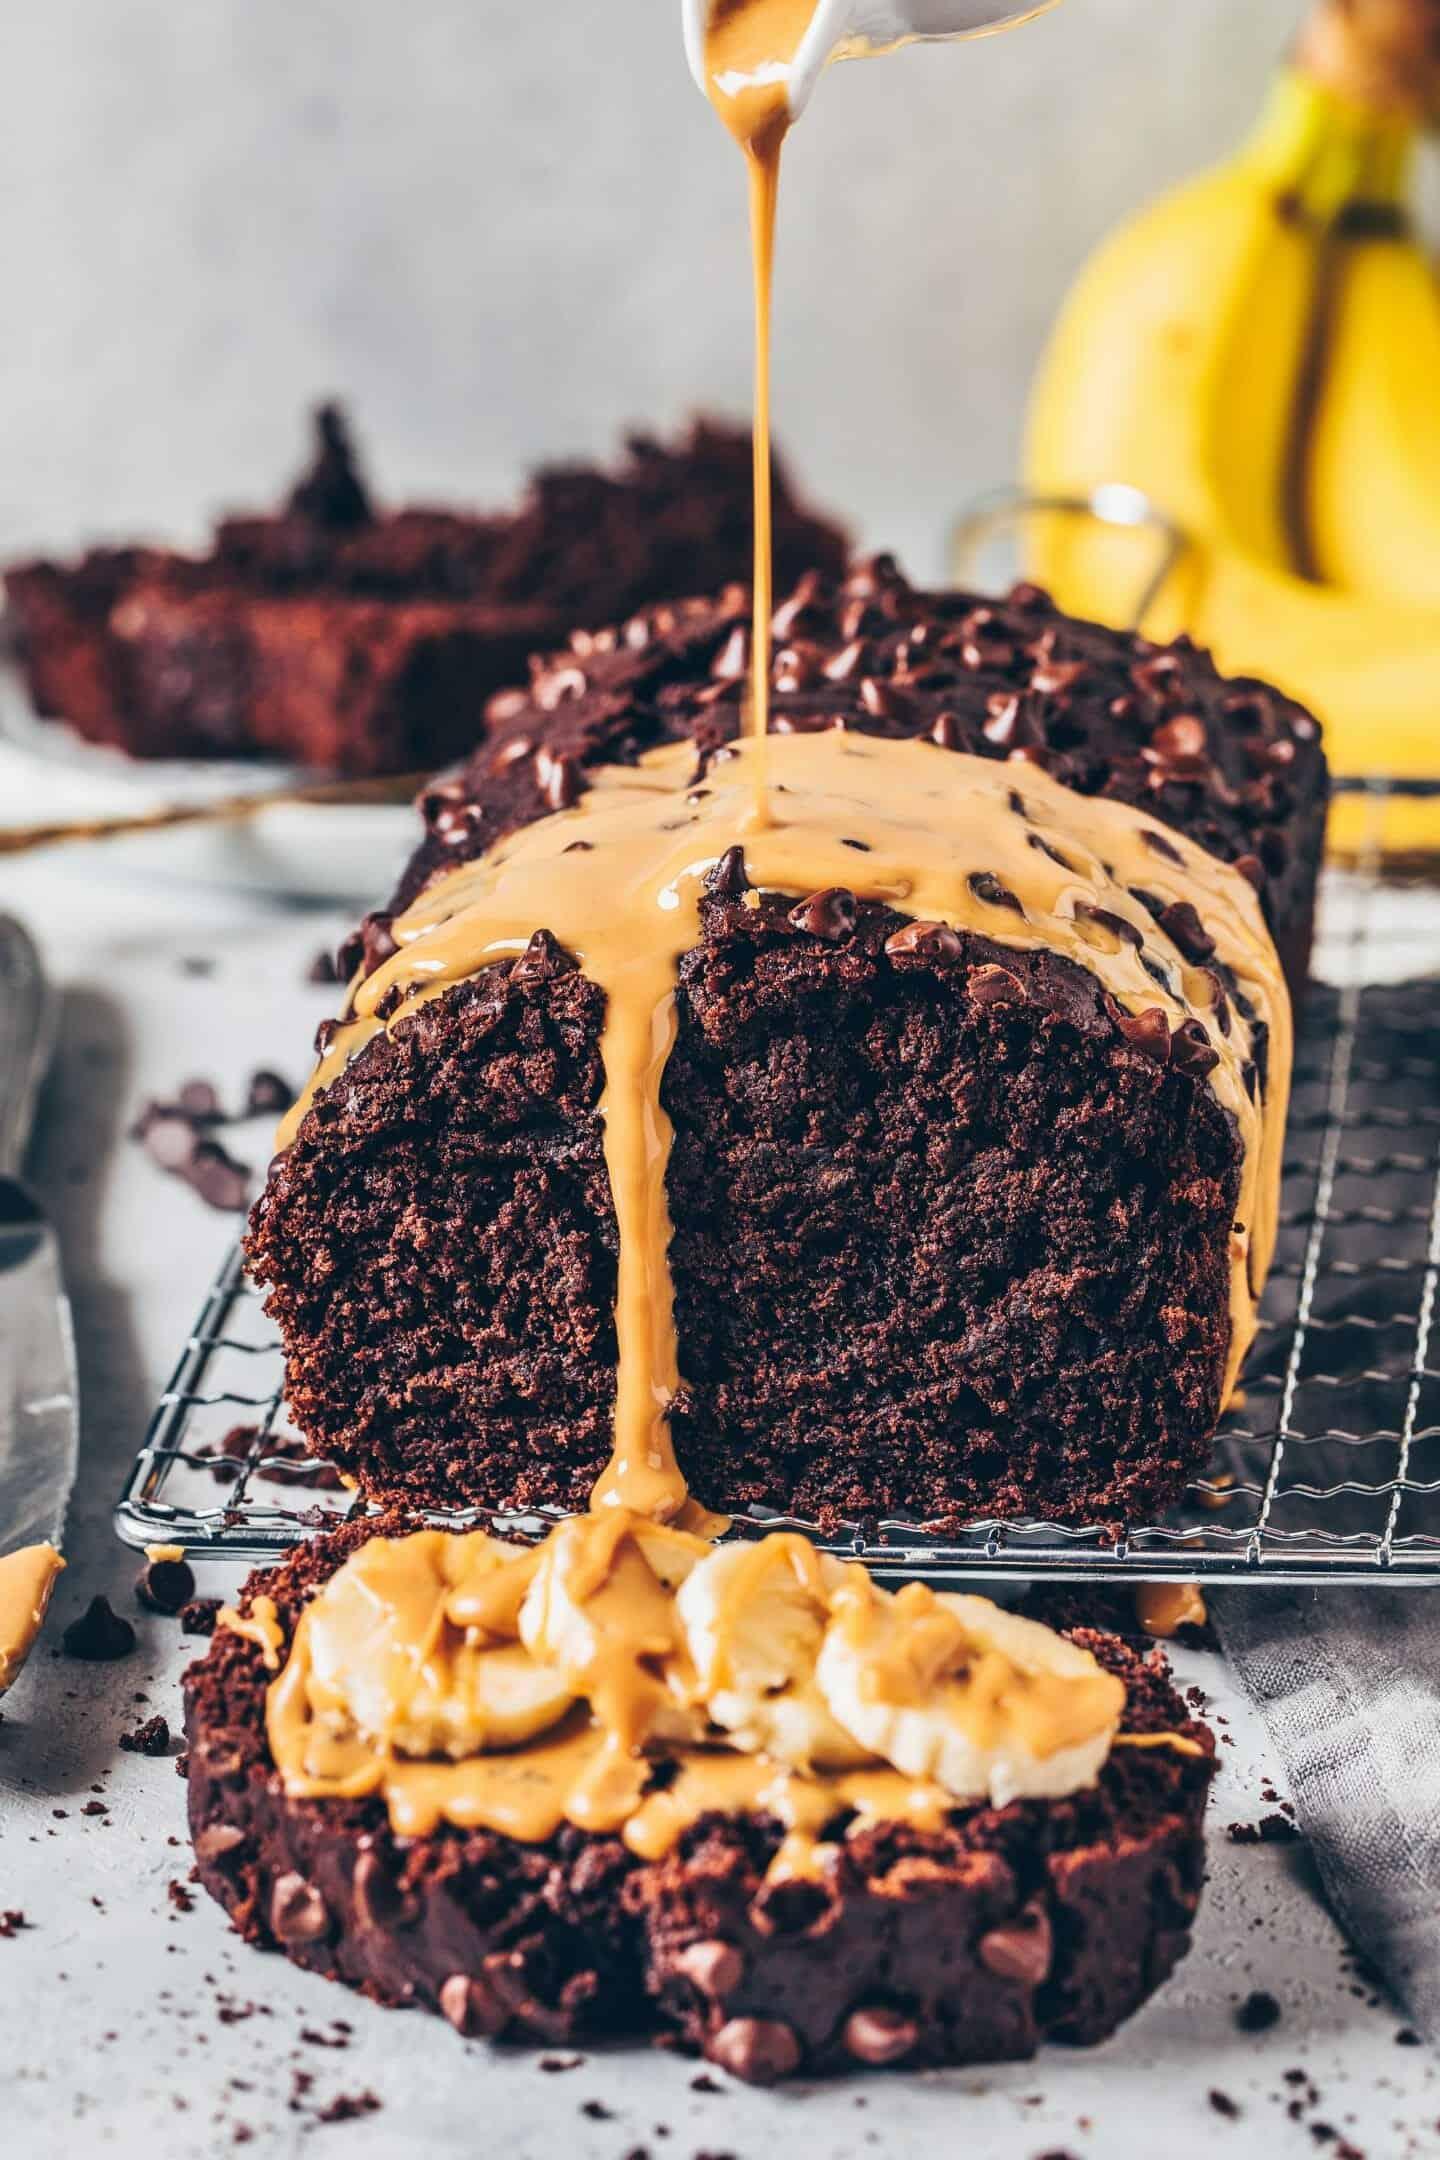 Best Vegan Chocolate Banana Bread Bianca Zapatka Foodblog